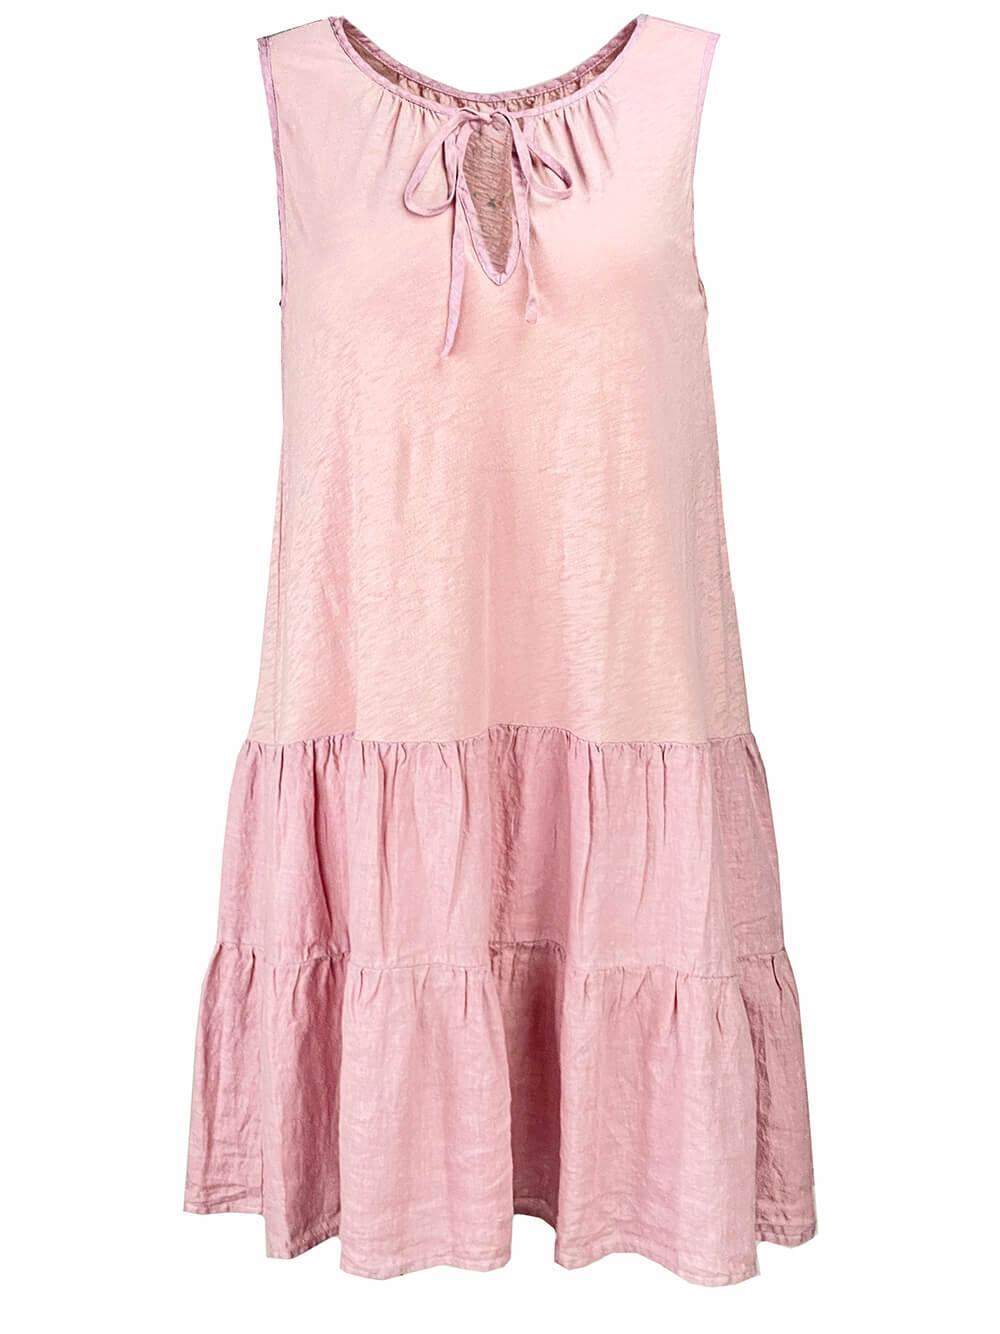 Sophia Tiered Dress